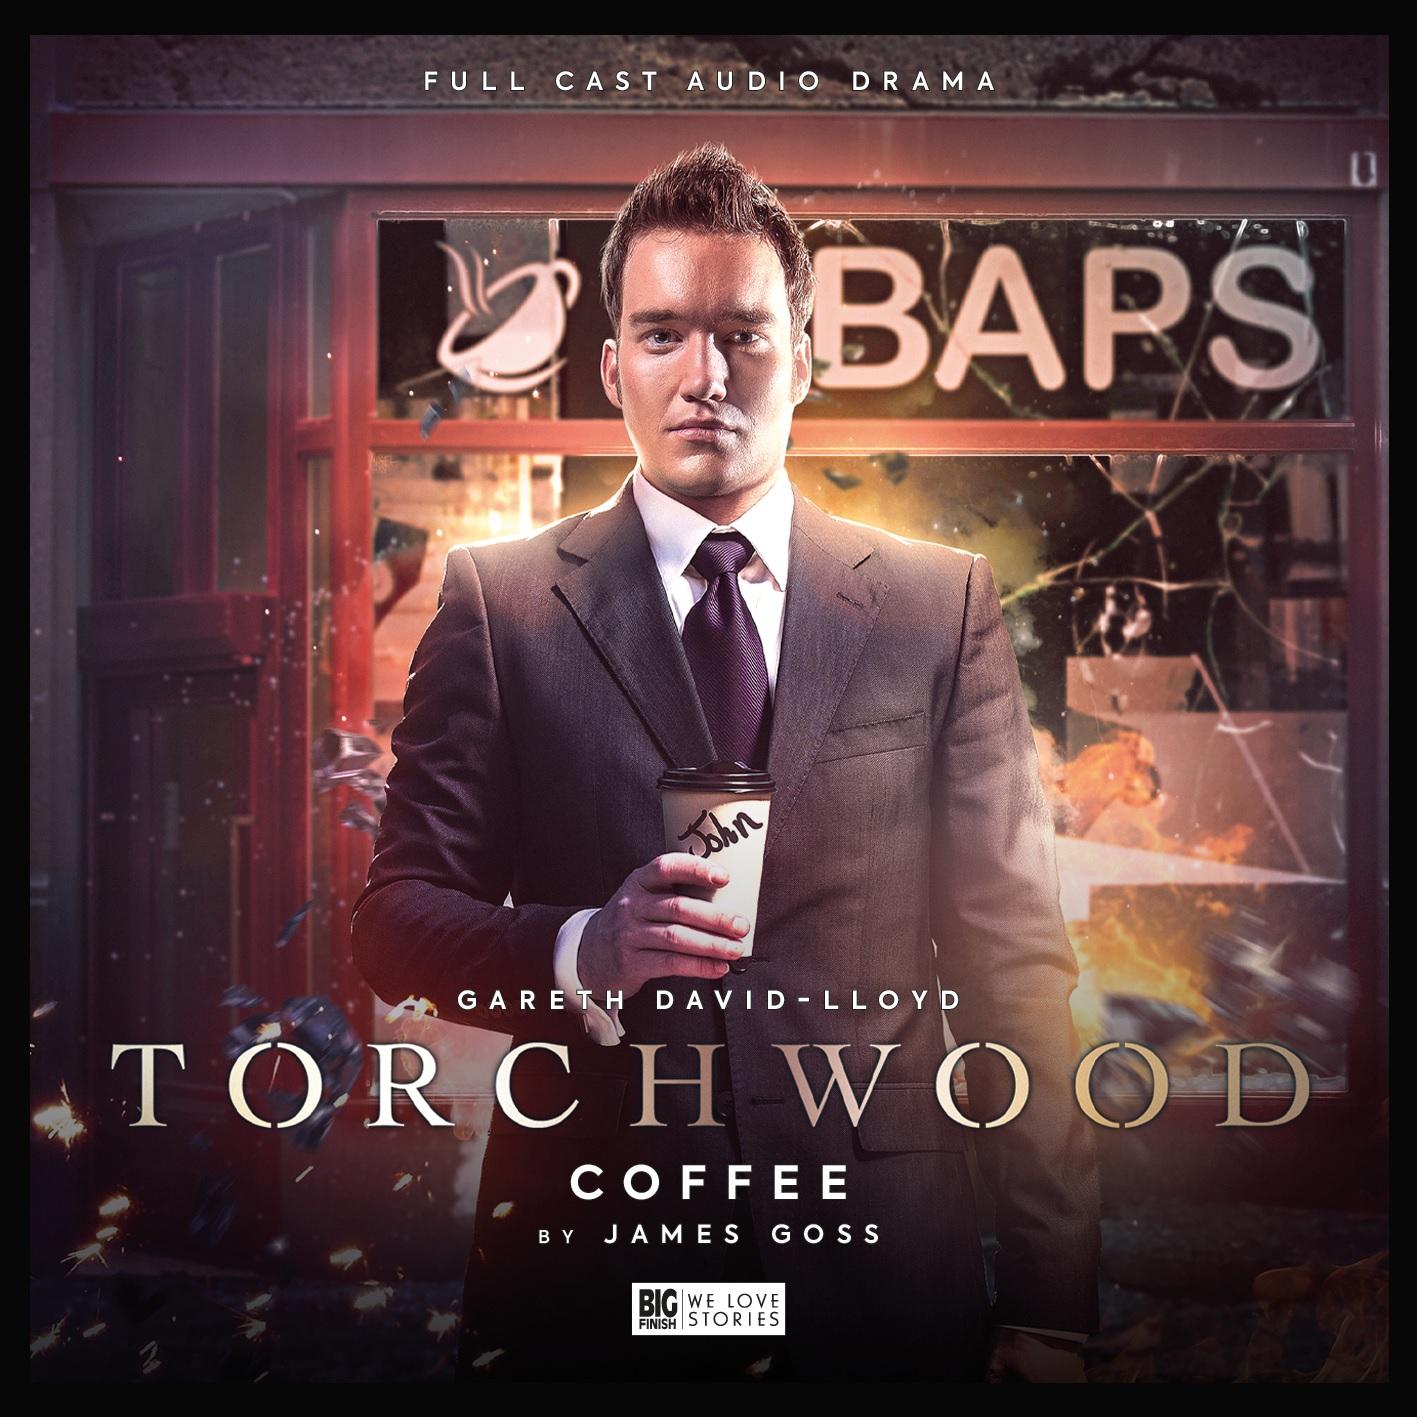 Reviewed: Big Finish's Torchwood – Coffee